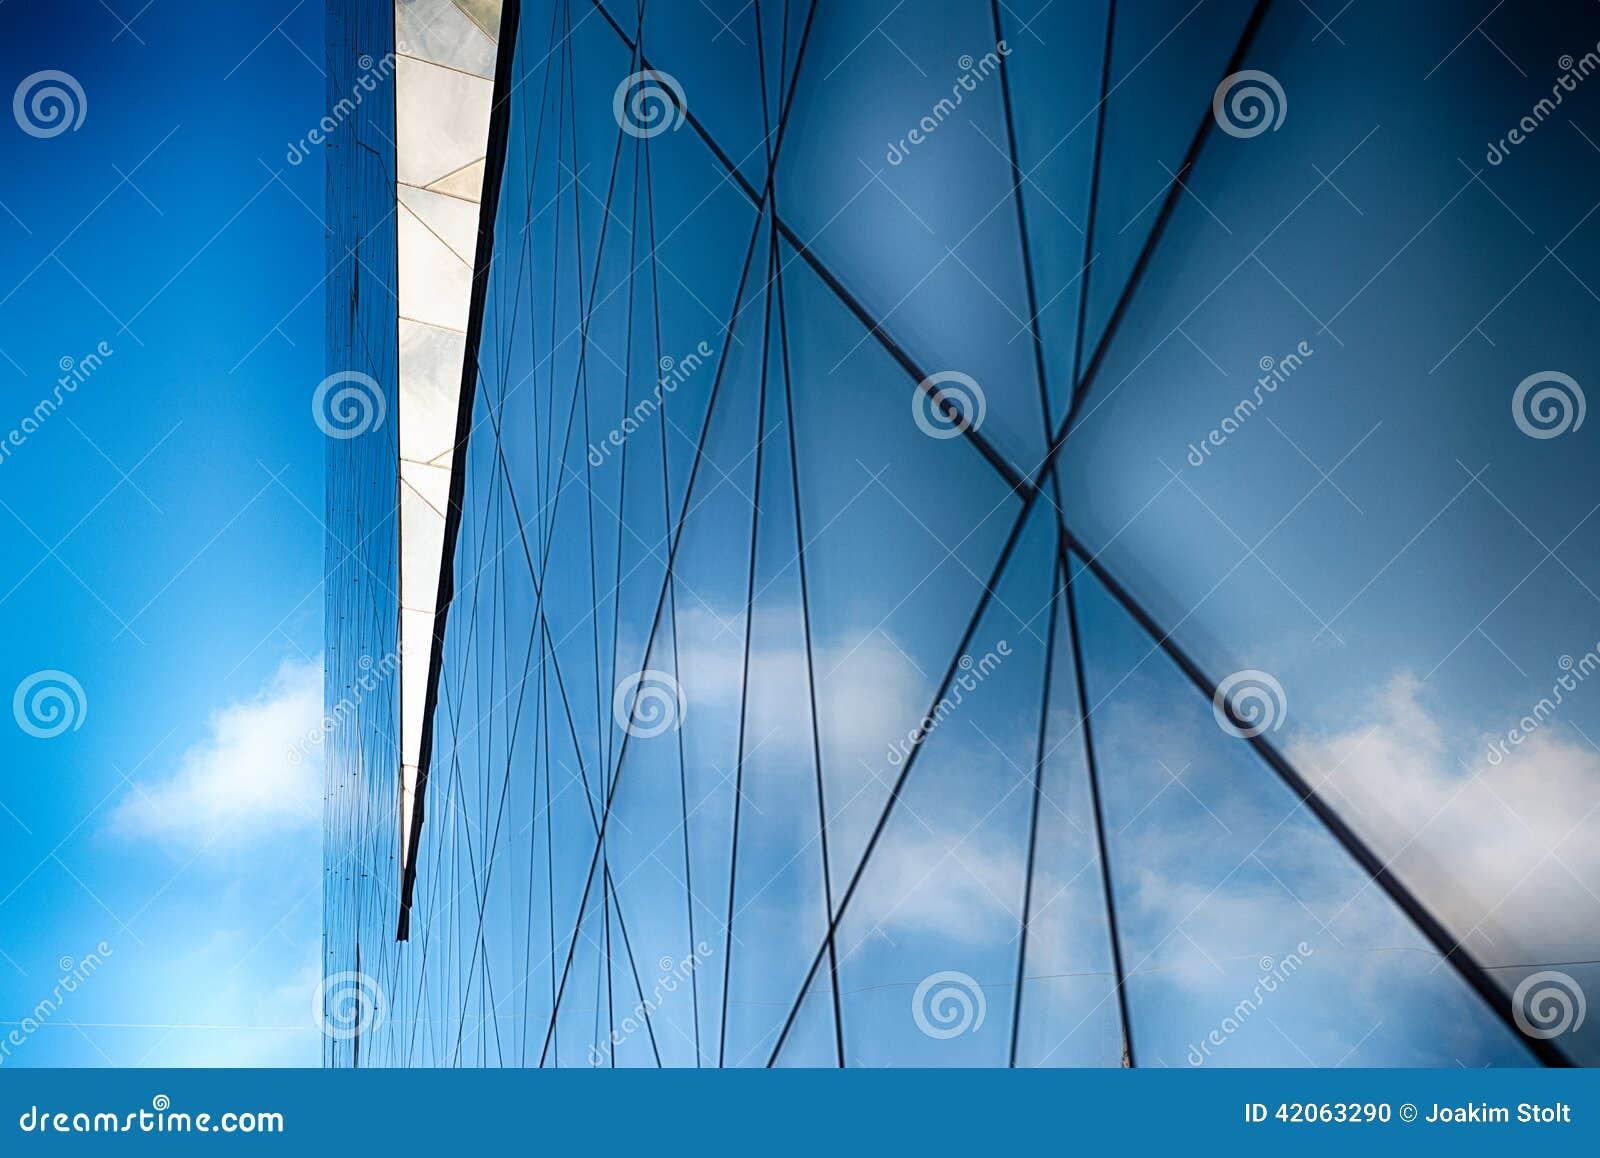 Edificio de cristal moderno en extracto